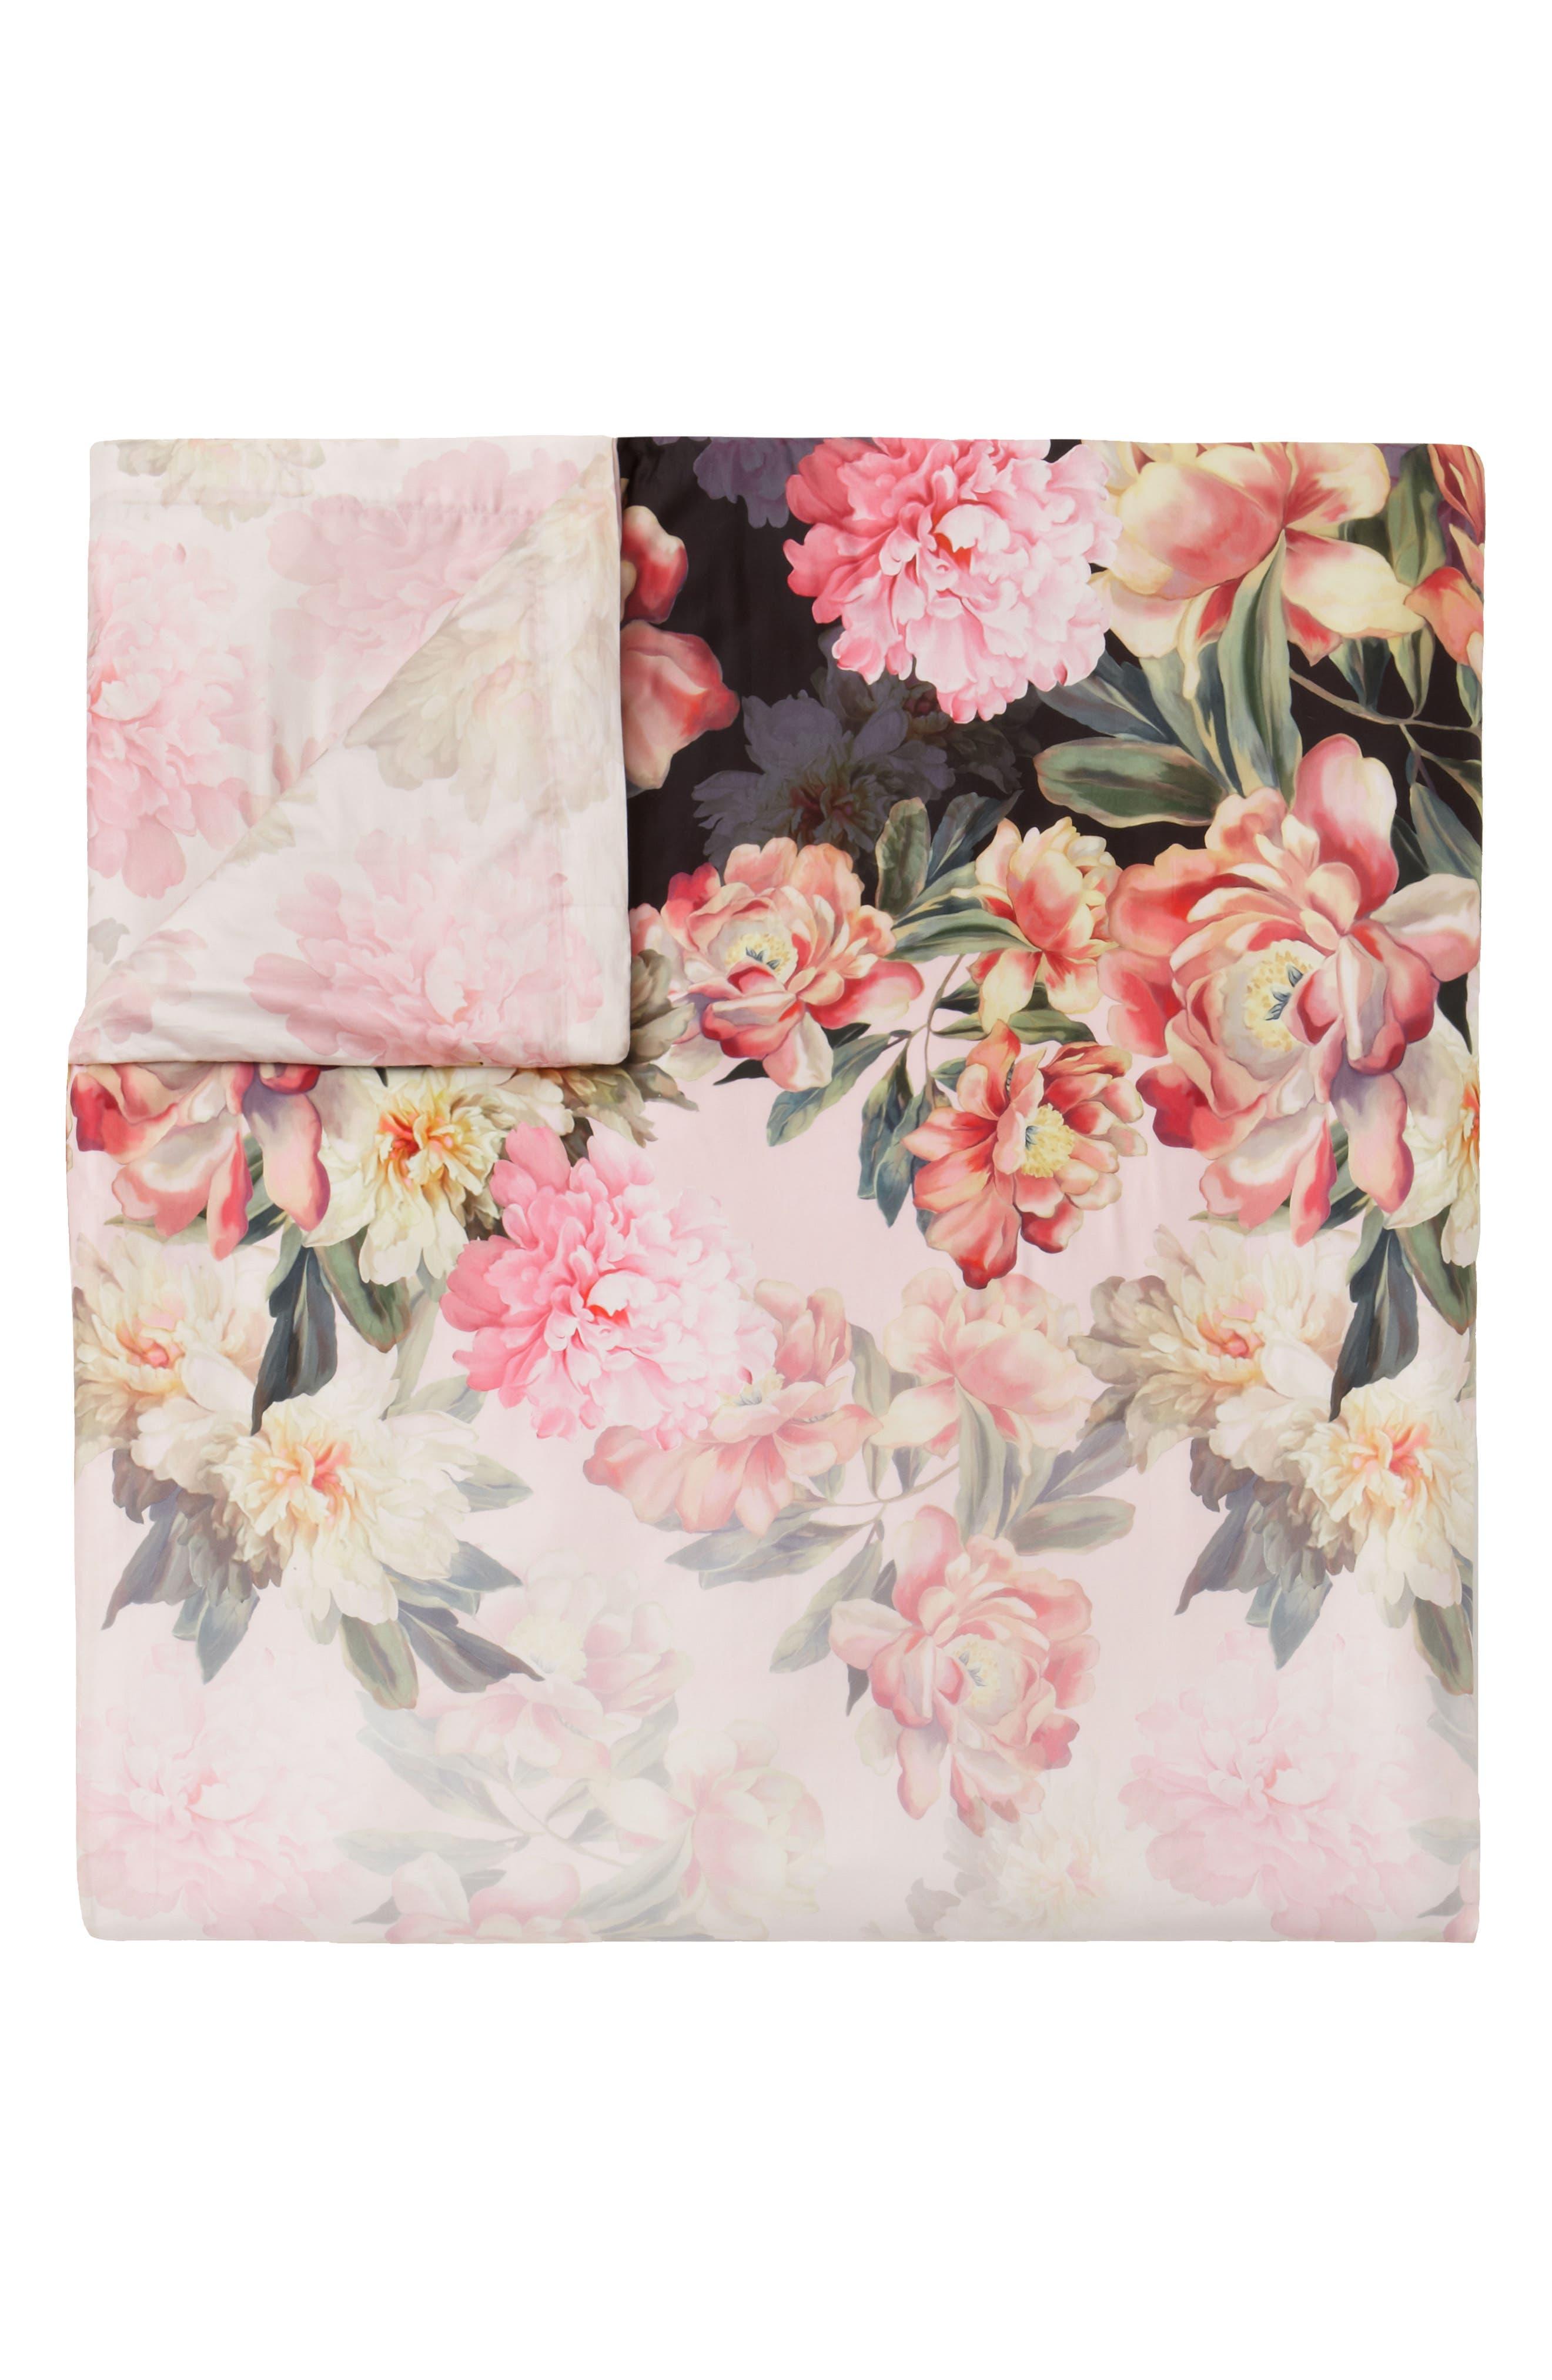 Painted Posie Duvet Cover & Sham Set,                             Alternate thumbnail 2, color,                             Pink/ Multi